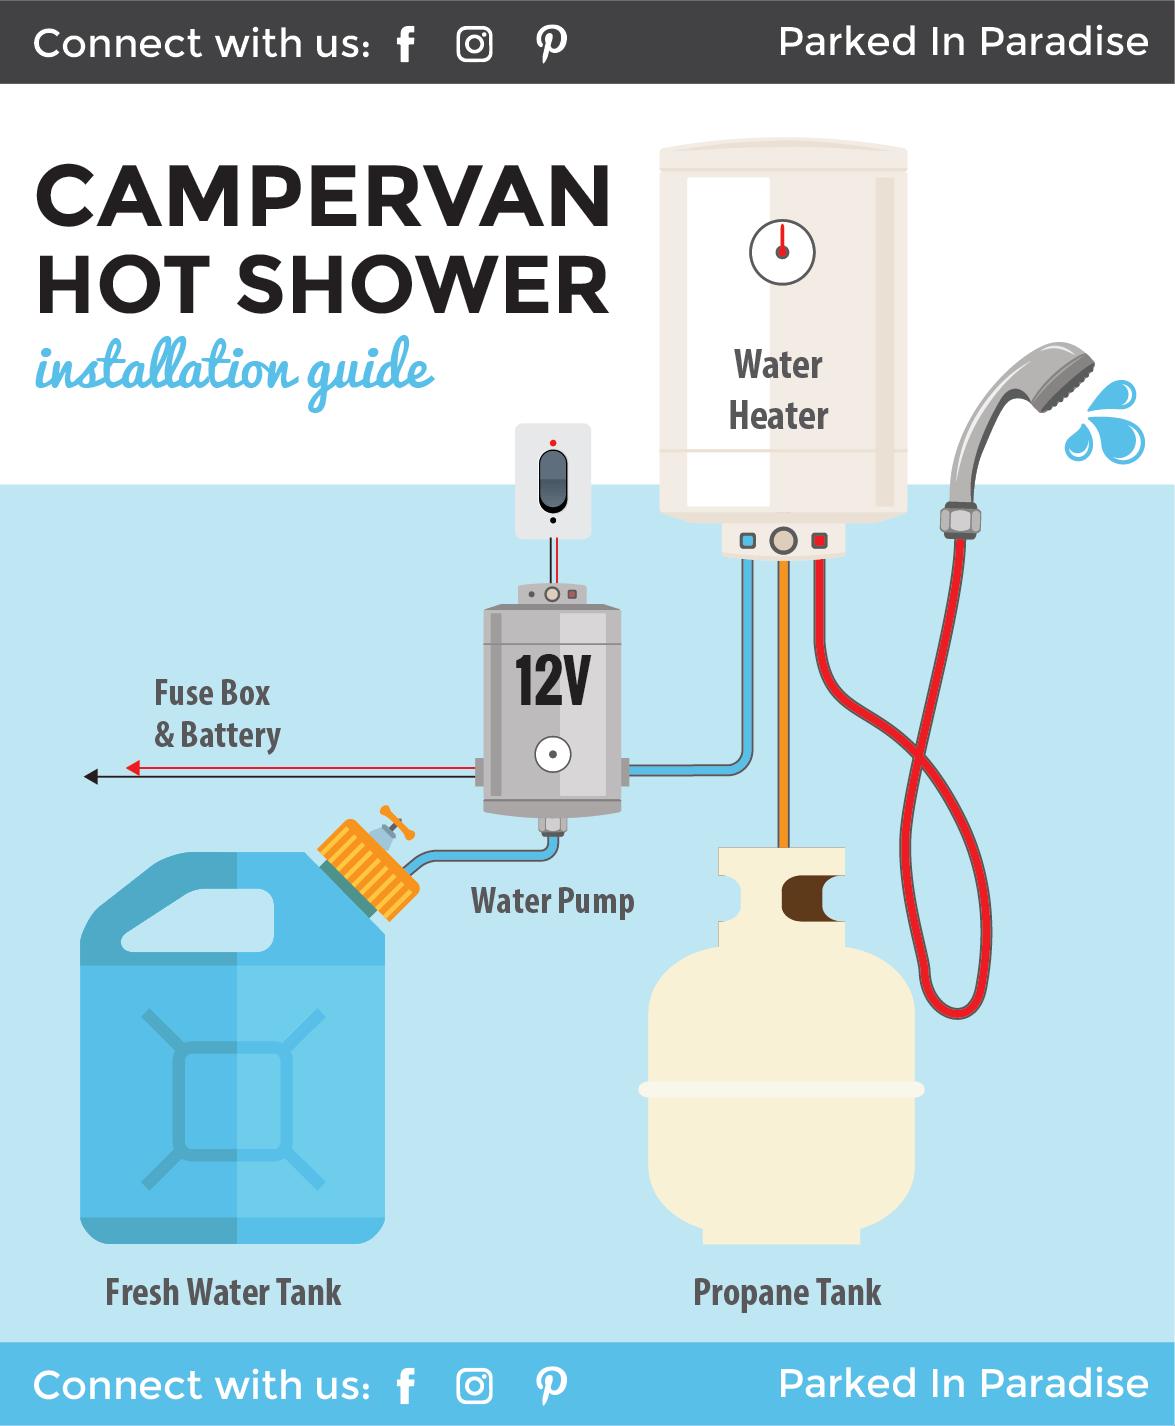 Installing A Portable 12v Water Heater In A Camper Van 12v Camper Diykitchenideassinks Heater Installing Portable Va In 2020 Van Life Campervan Camping Shower